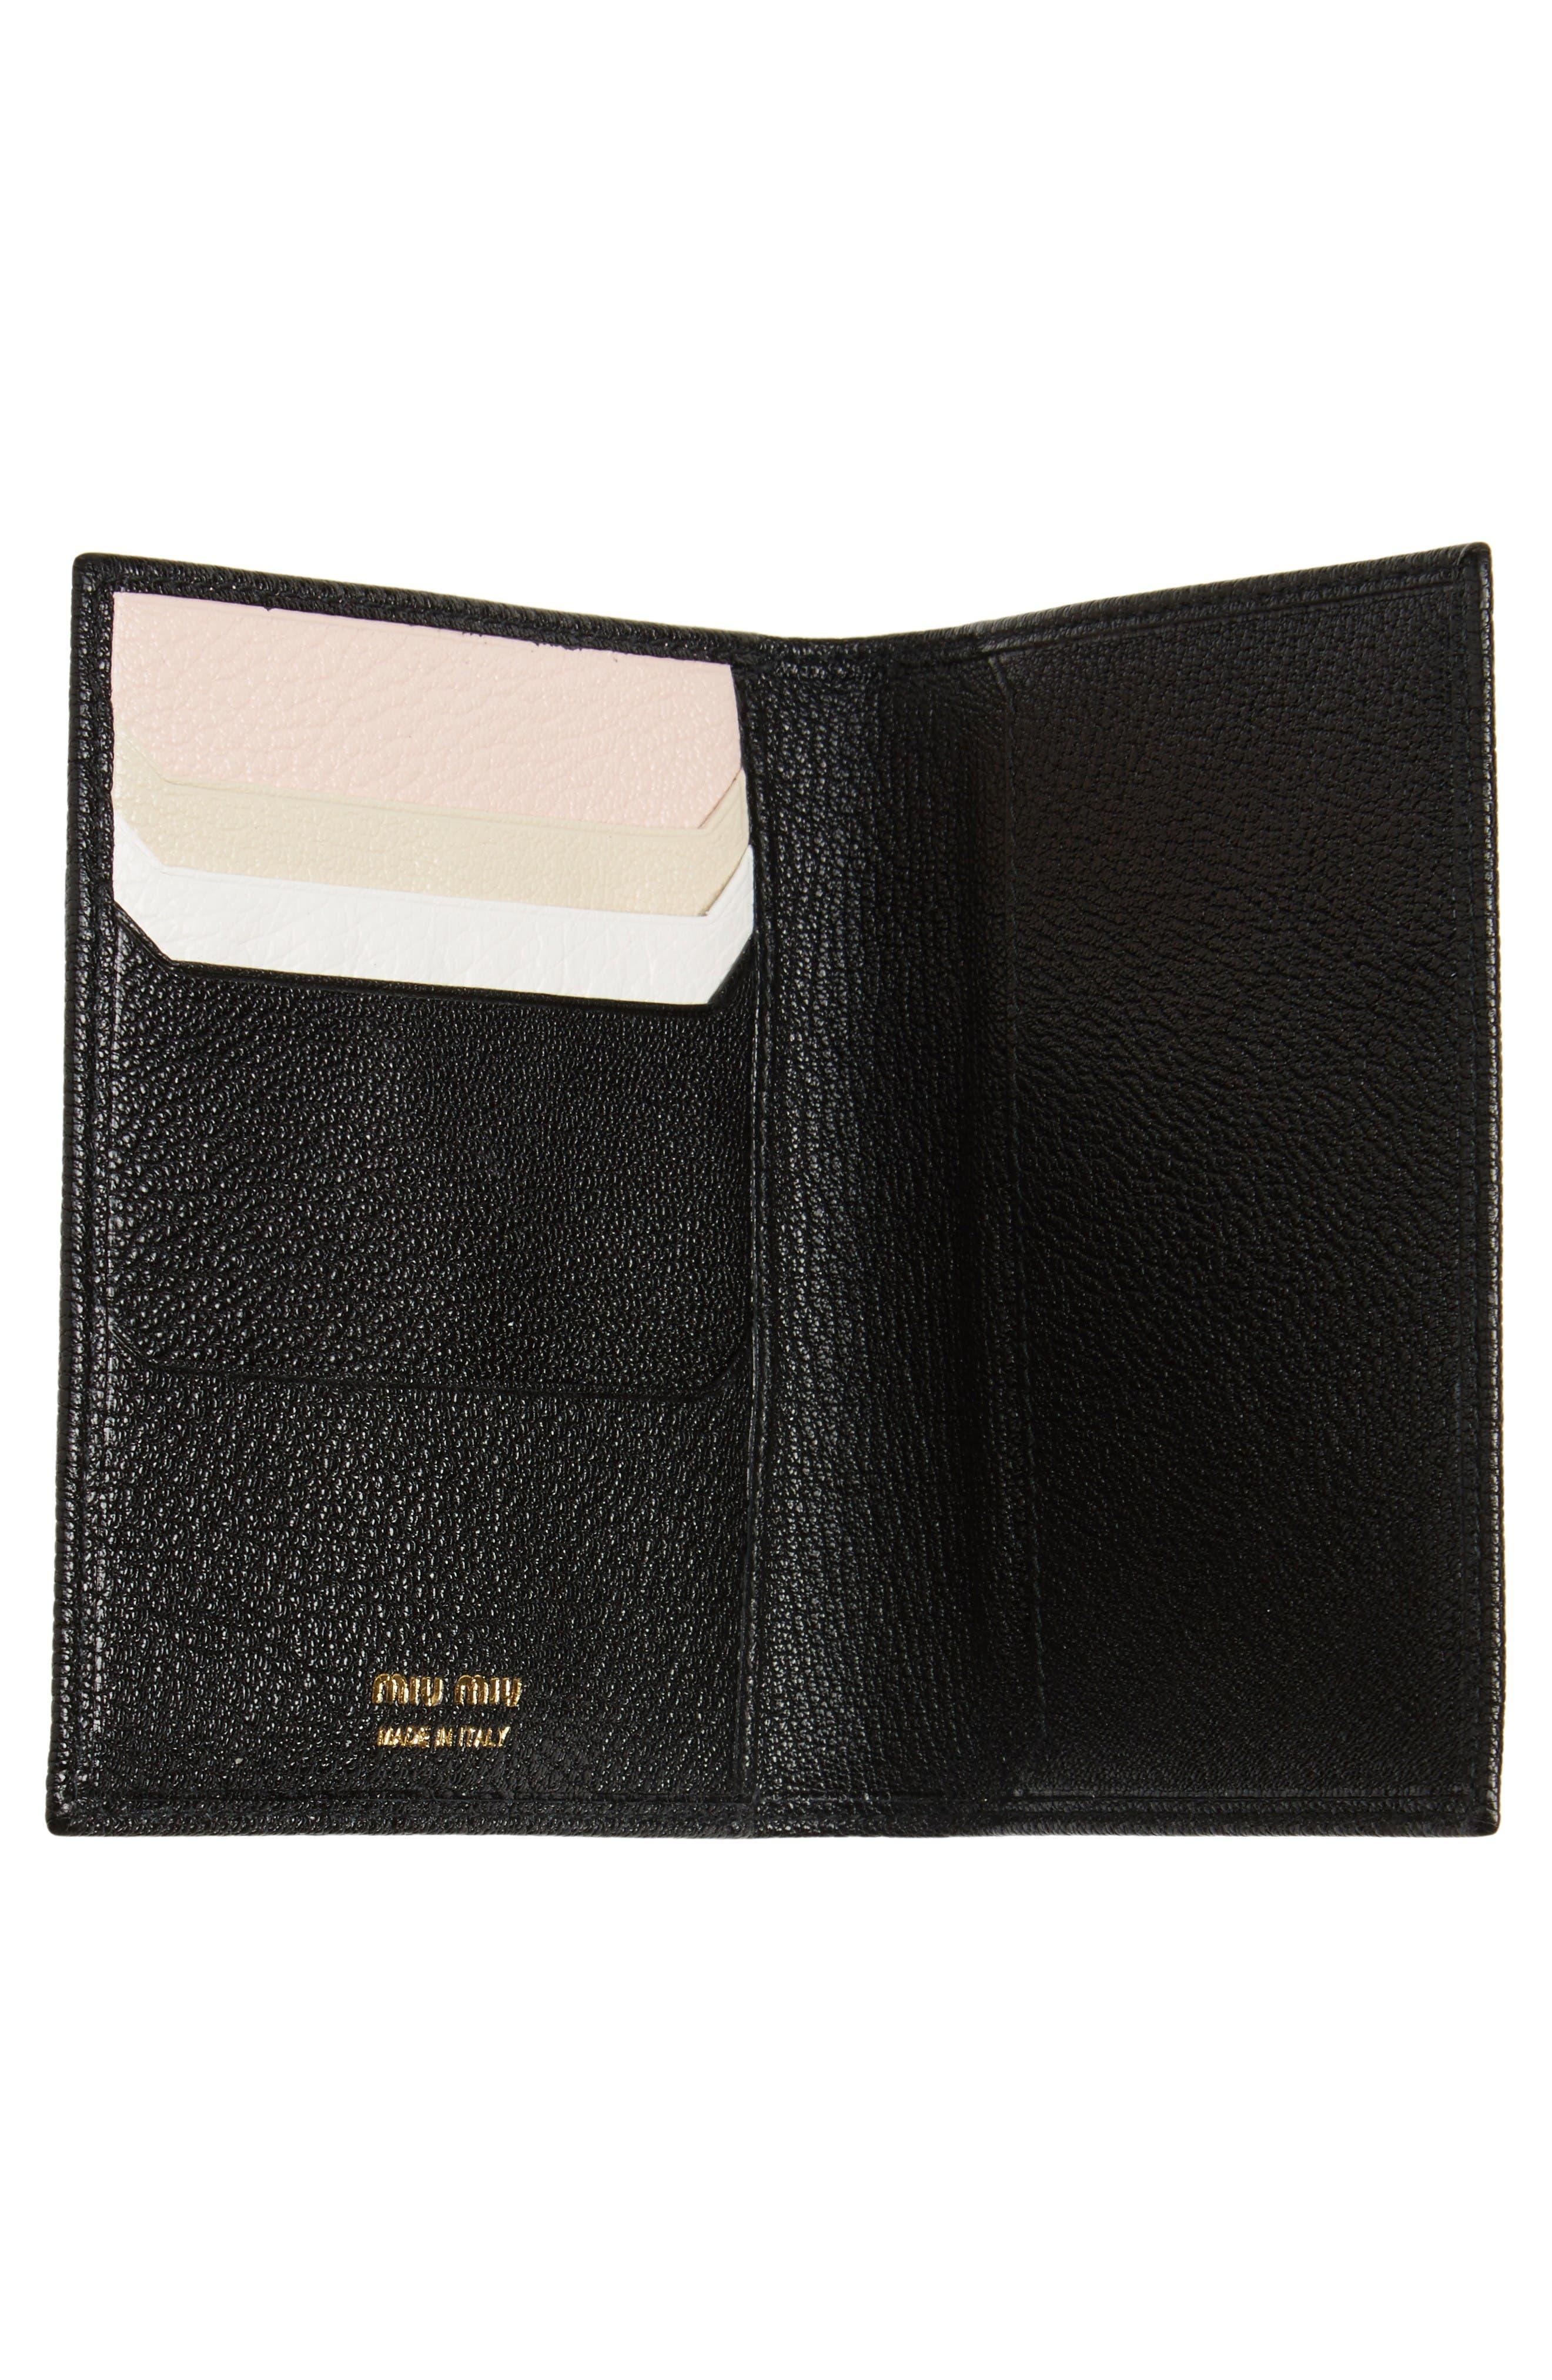 Alternate Image 2  - Miu Miu Leather Passport Case